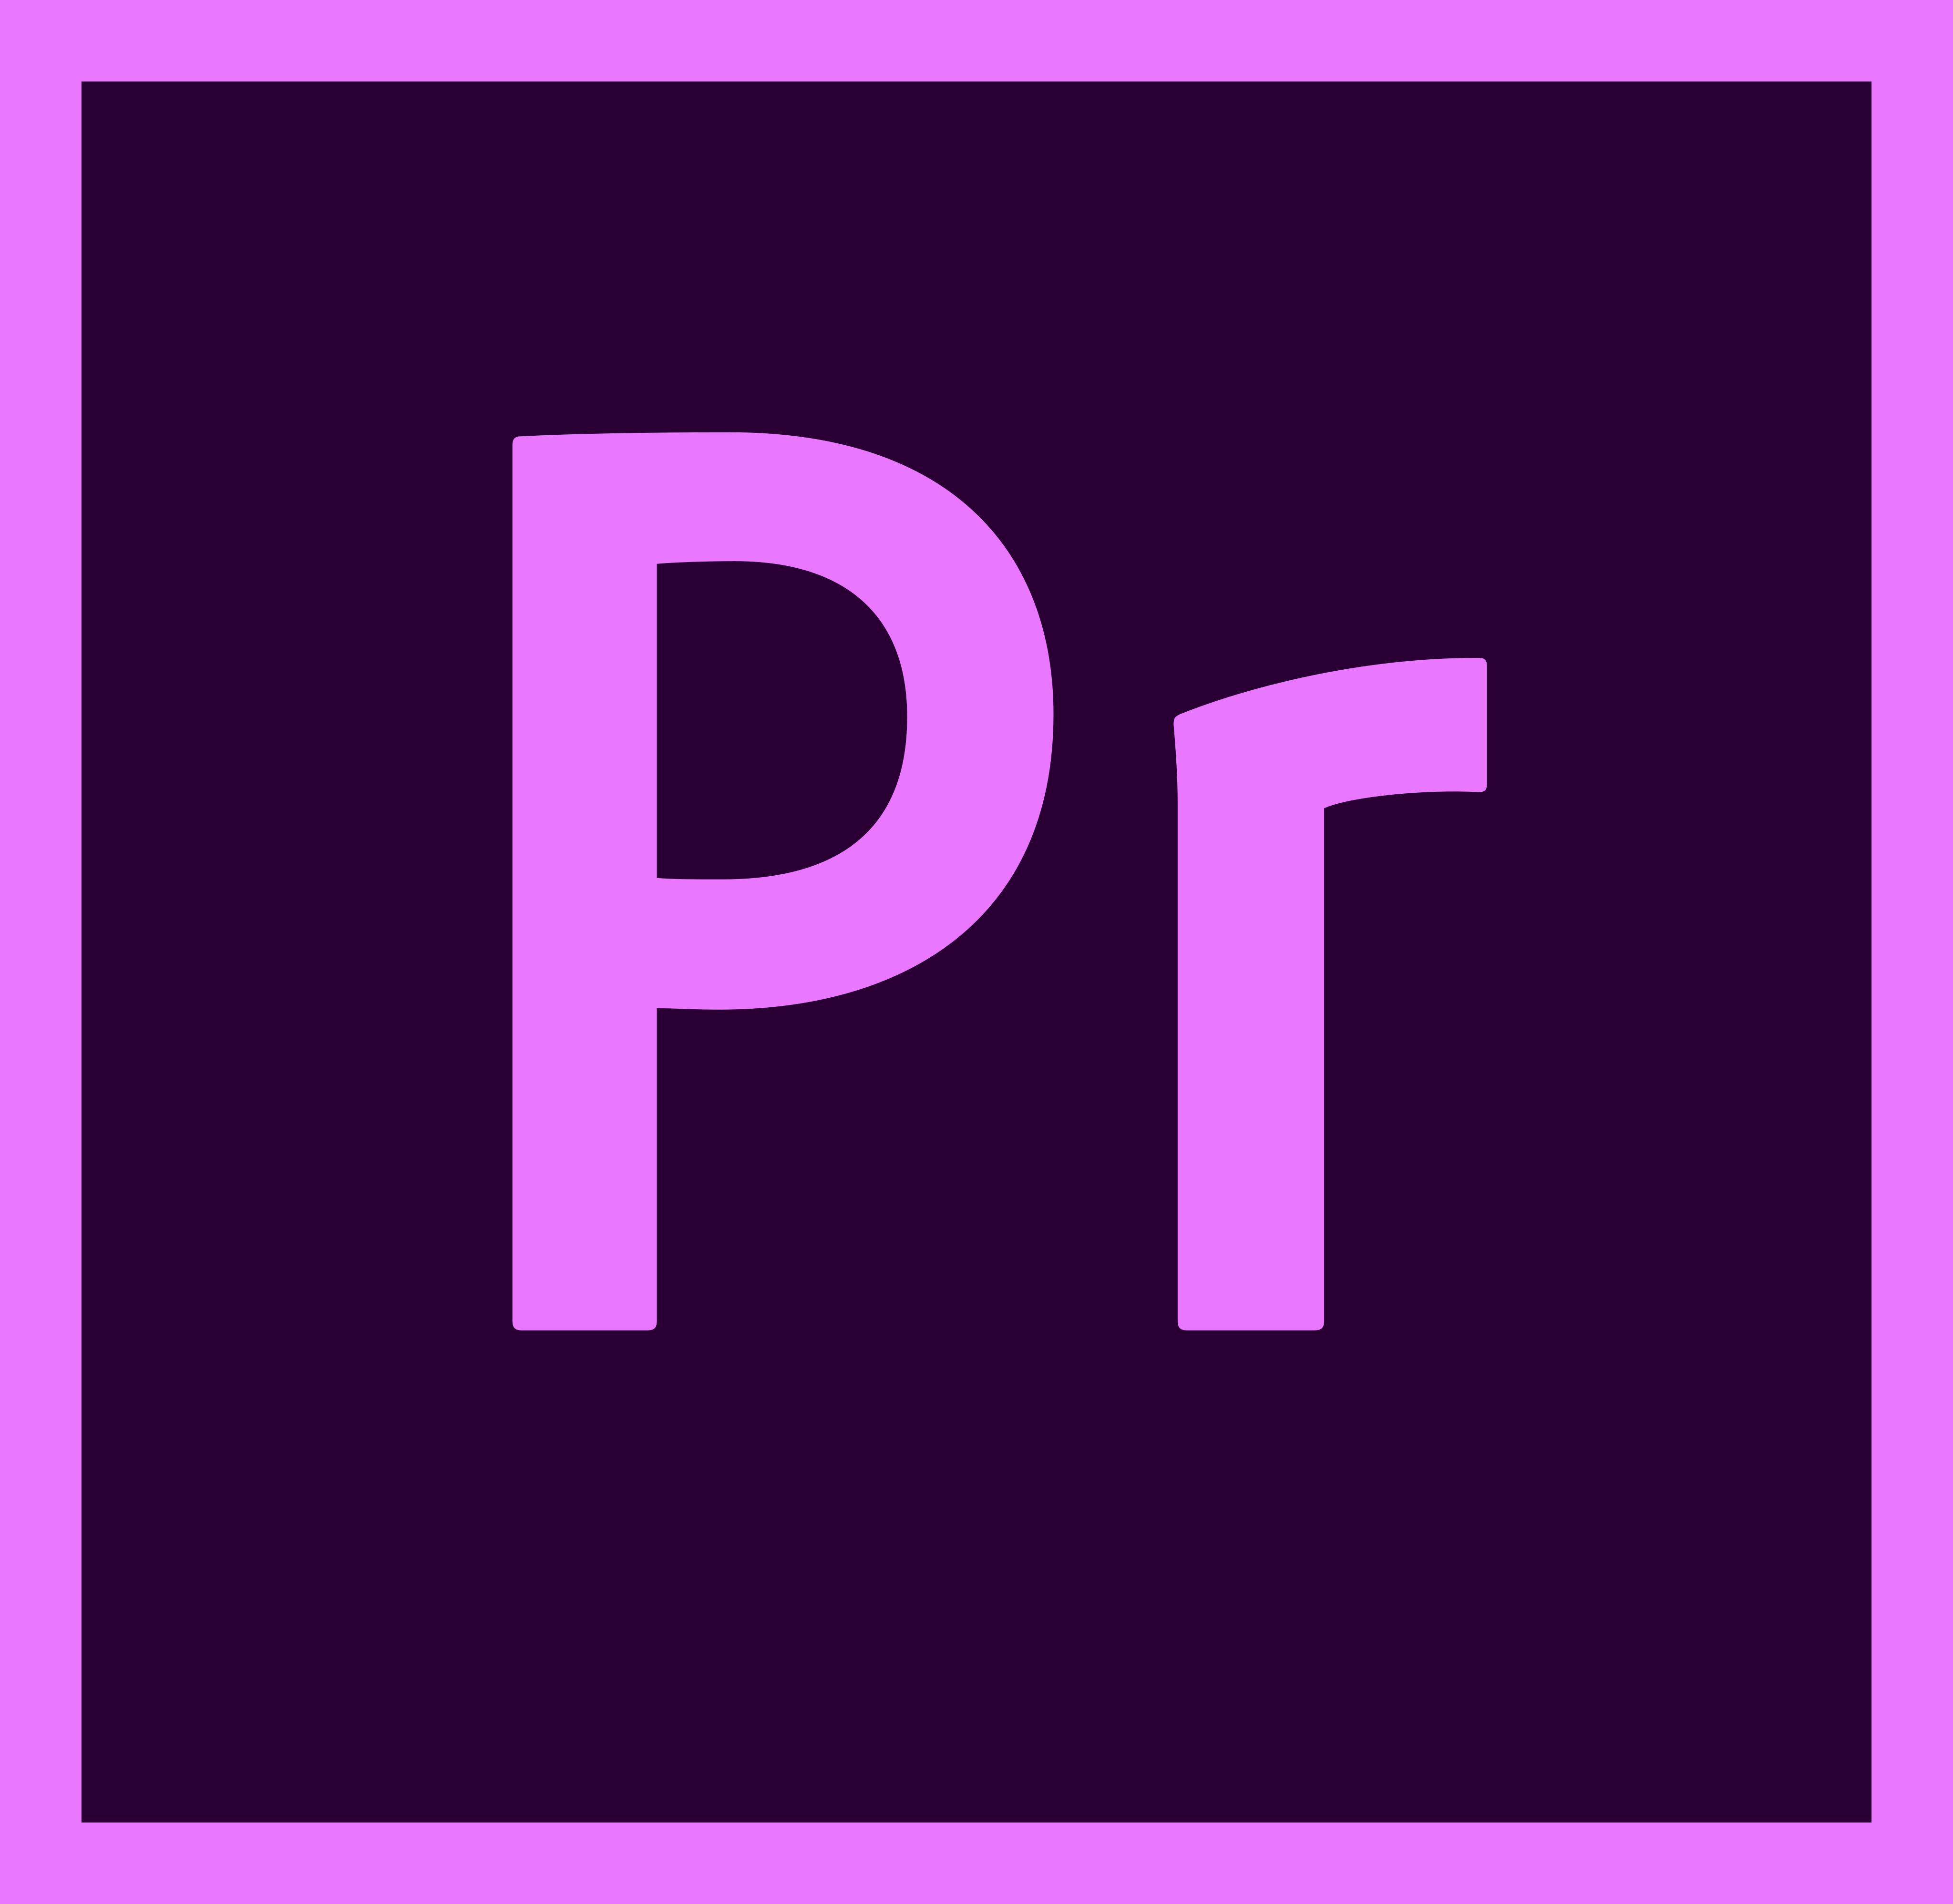 adobe premiere pro logo - Adobe Premiere Pro Logo